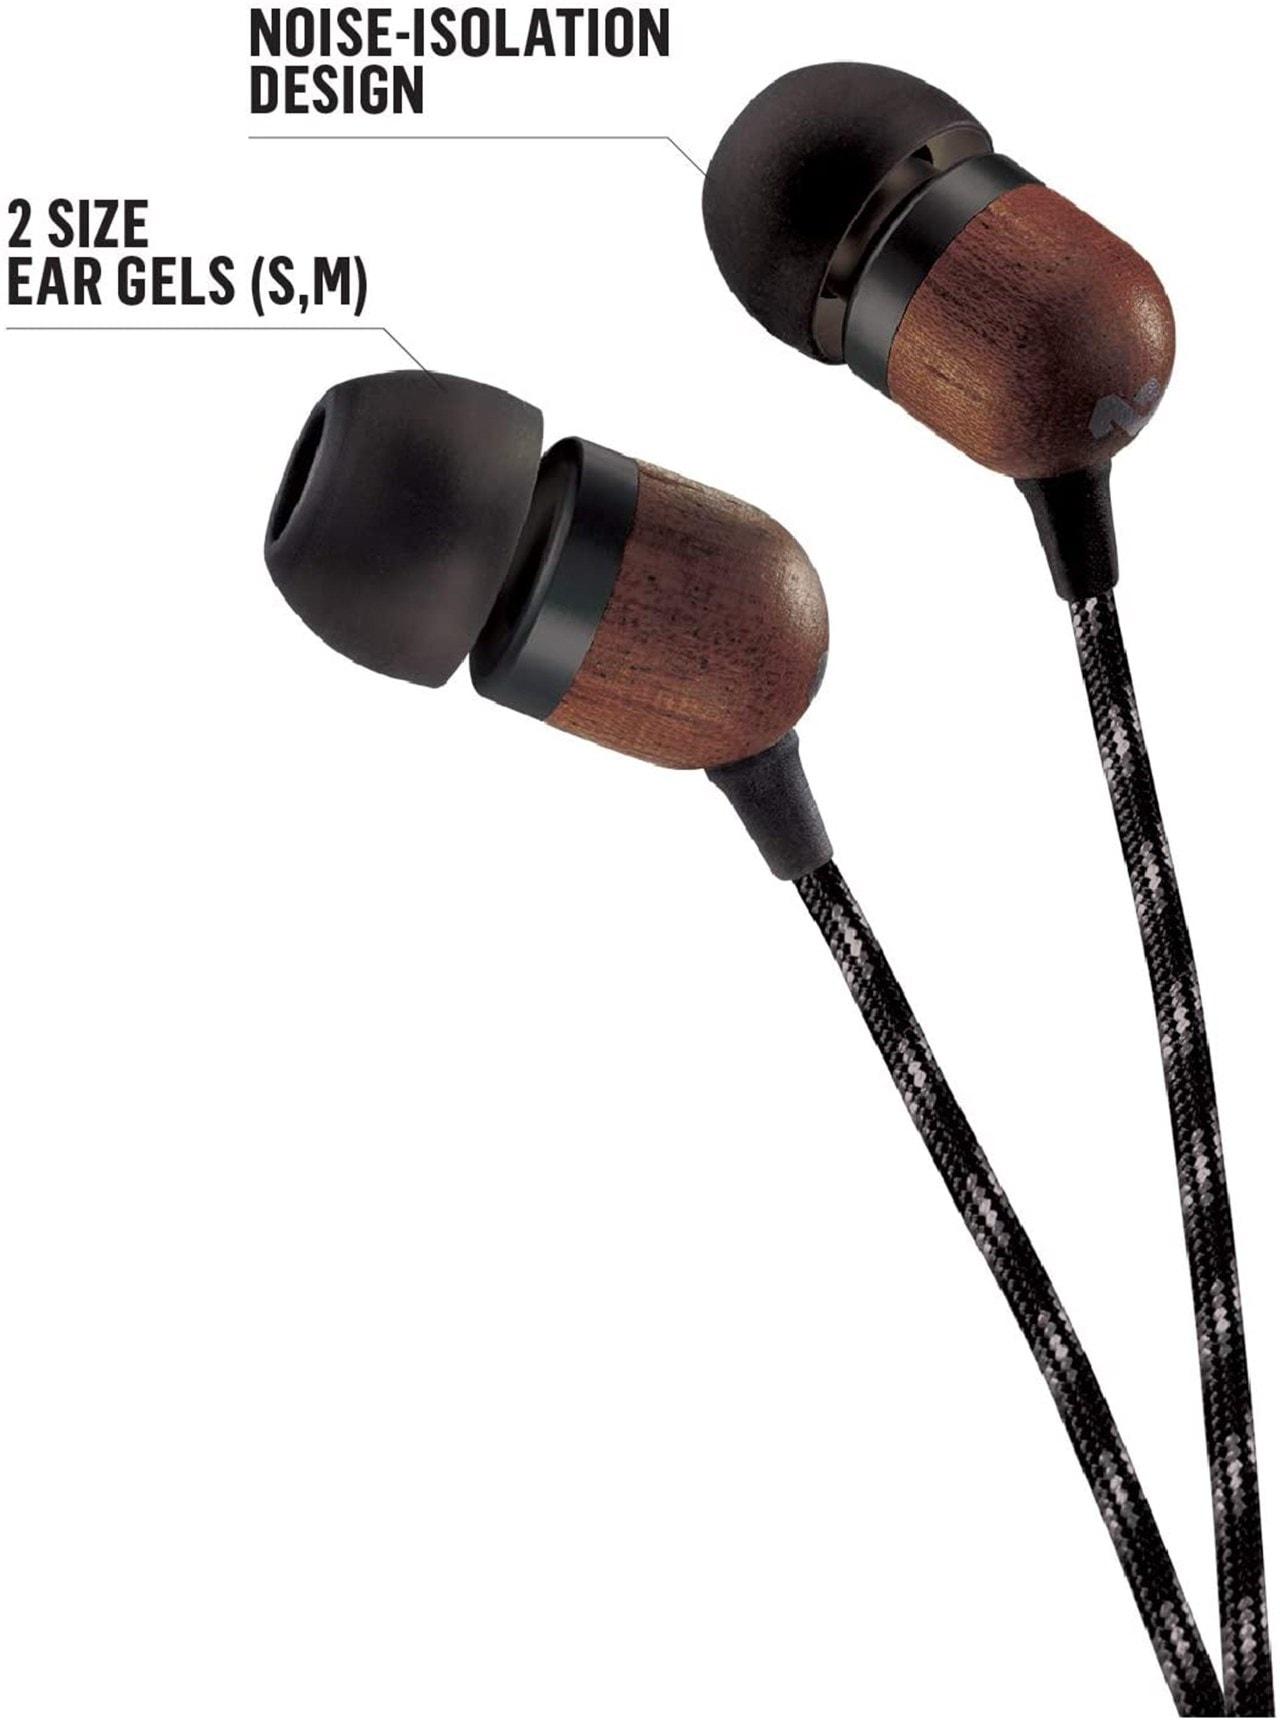 House Of Marley Smile Jamaica Signature Black Earphones W/Mic - 3